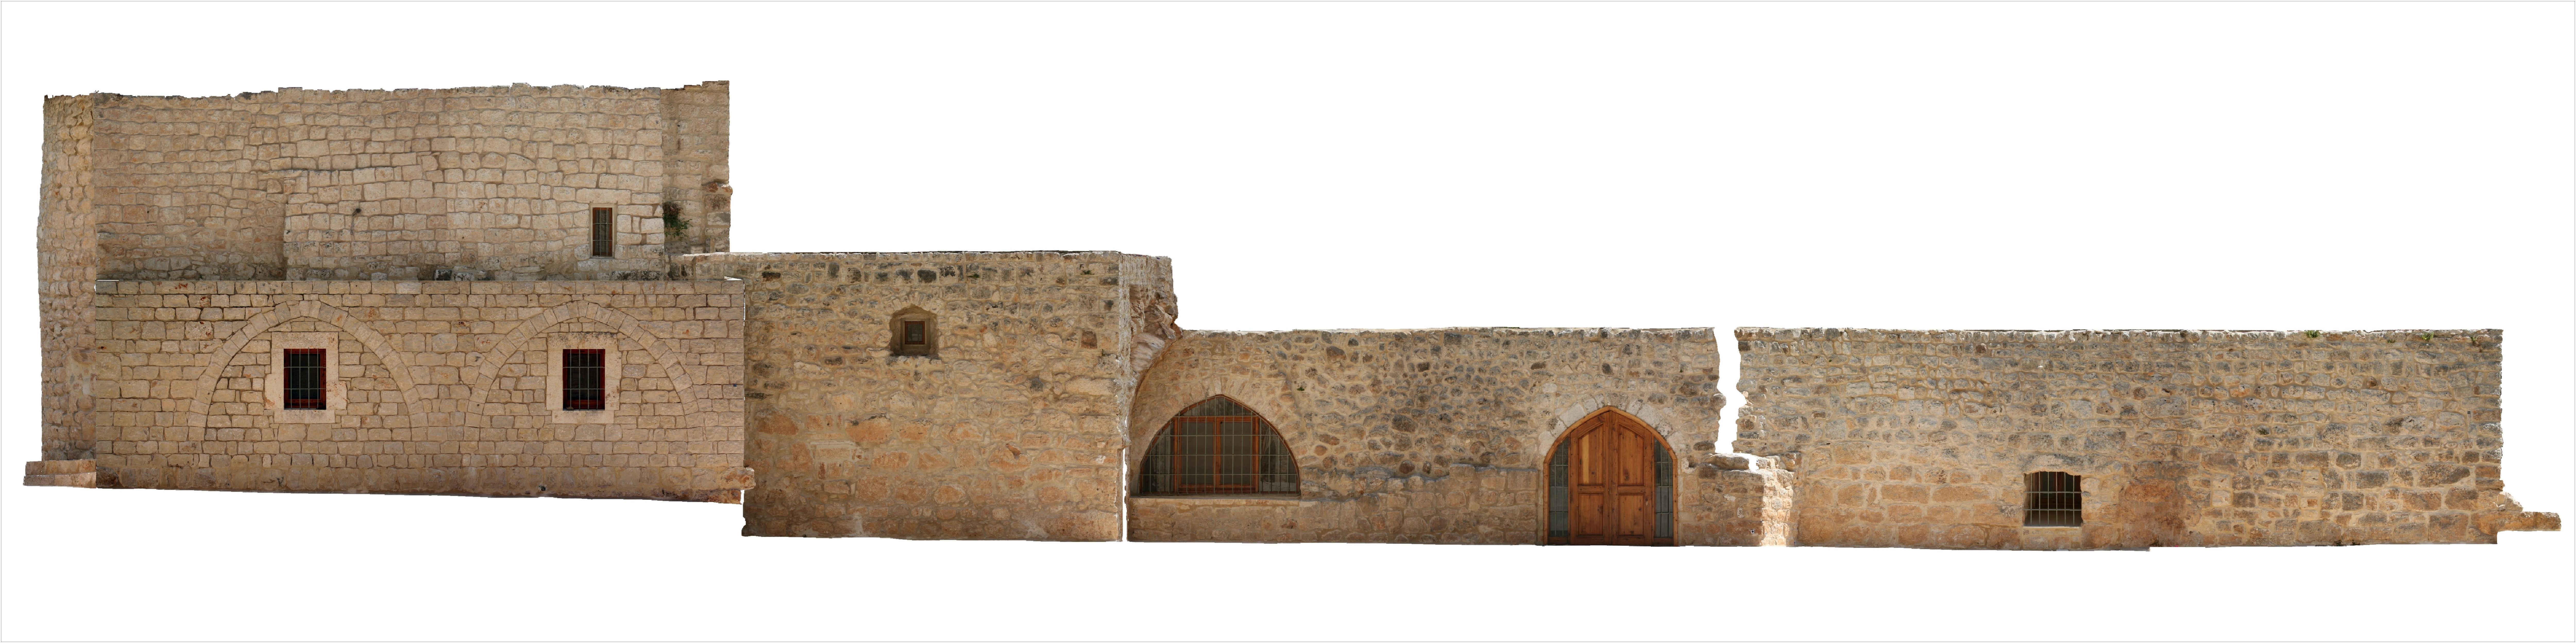 Fig. 9: Northern elevation of the church, photogrammetrical view (Waliszewski and Chmielewski 2009–2010)